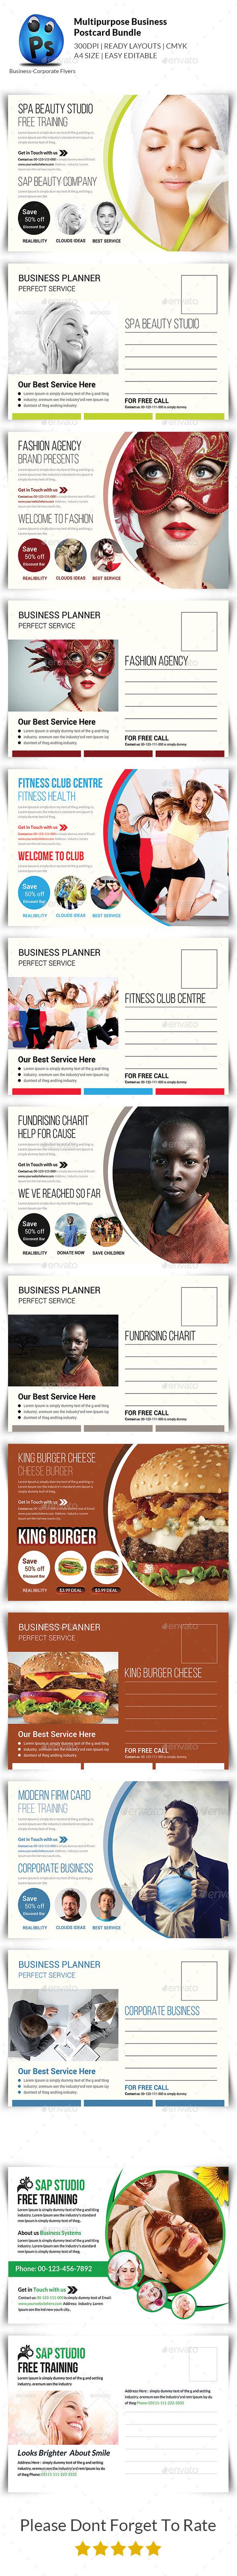 Multipurpose Business Postcard Bundle - Cards & Invites Print Templates